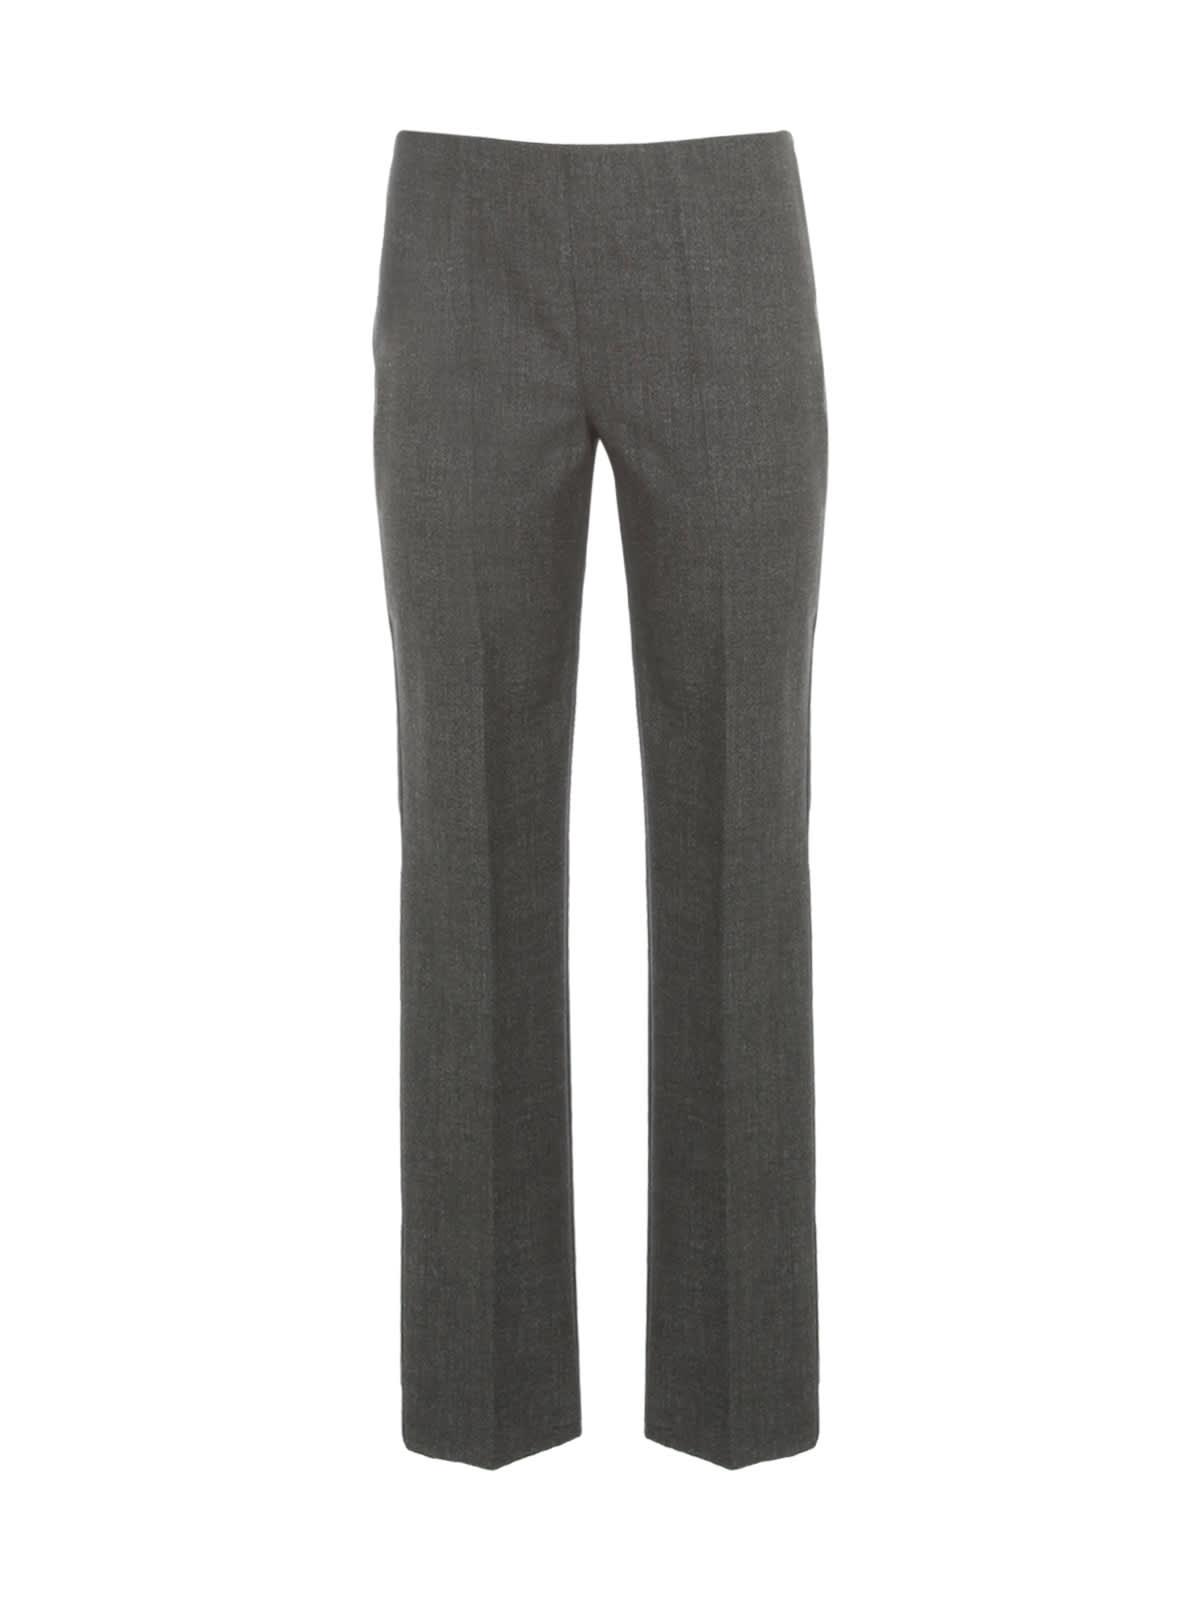 Parosh Skinny Elastic Pants from ParoshComposition: 52% Polyester, 43% Wool, 5% Other Fibres